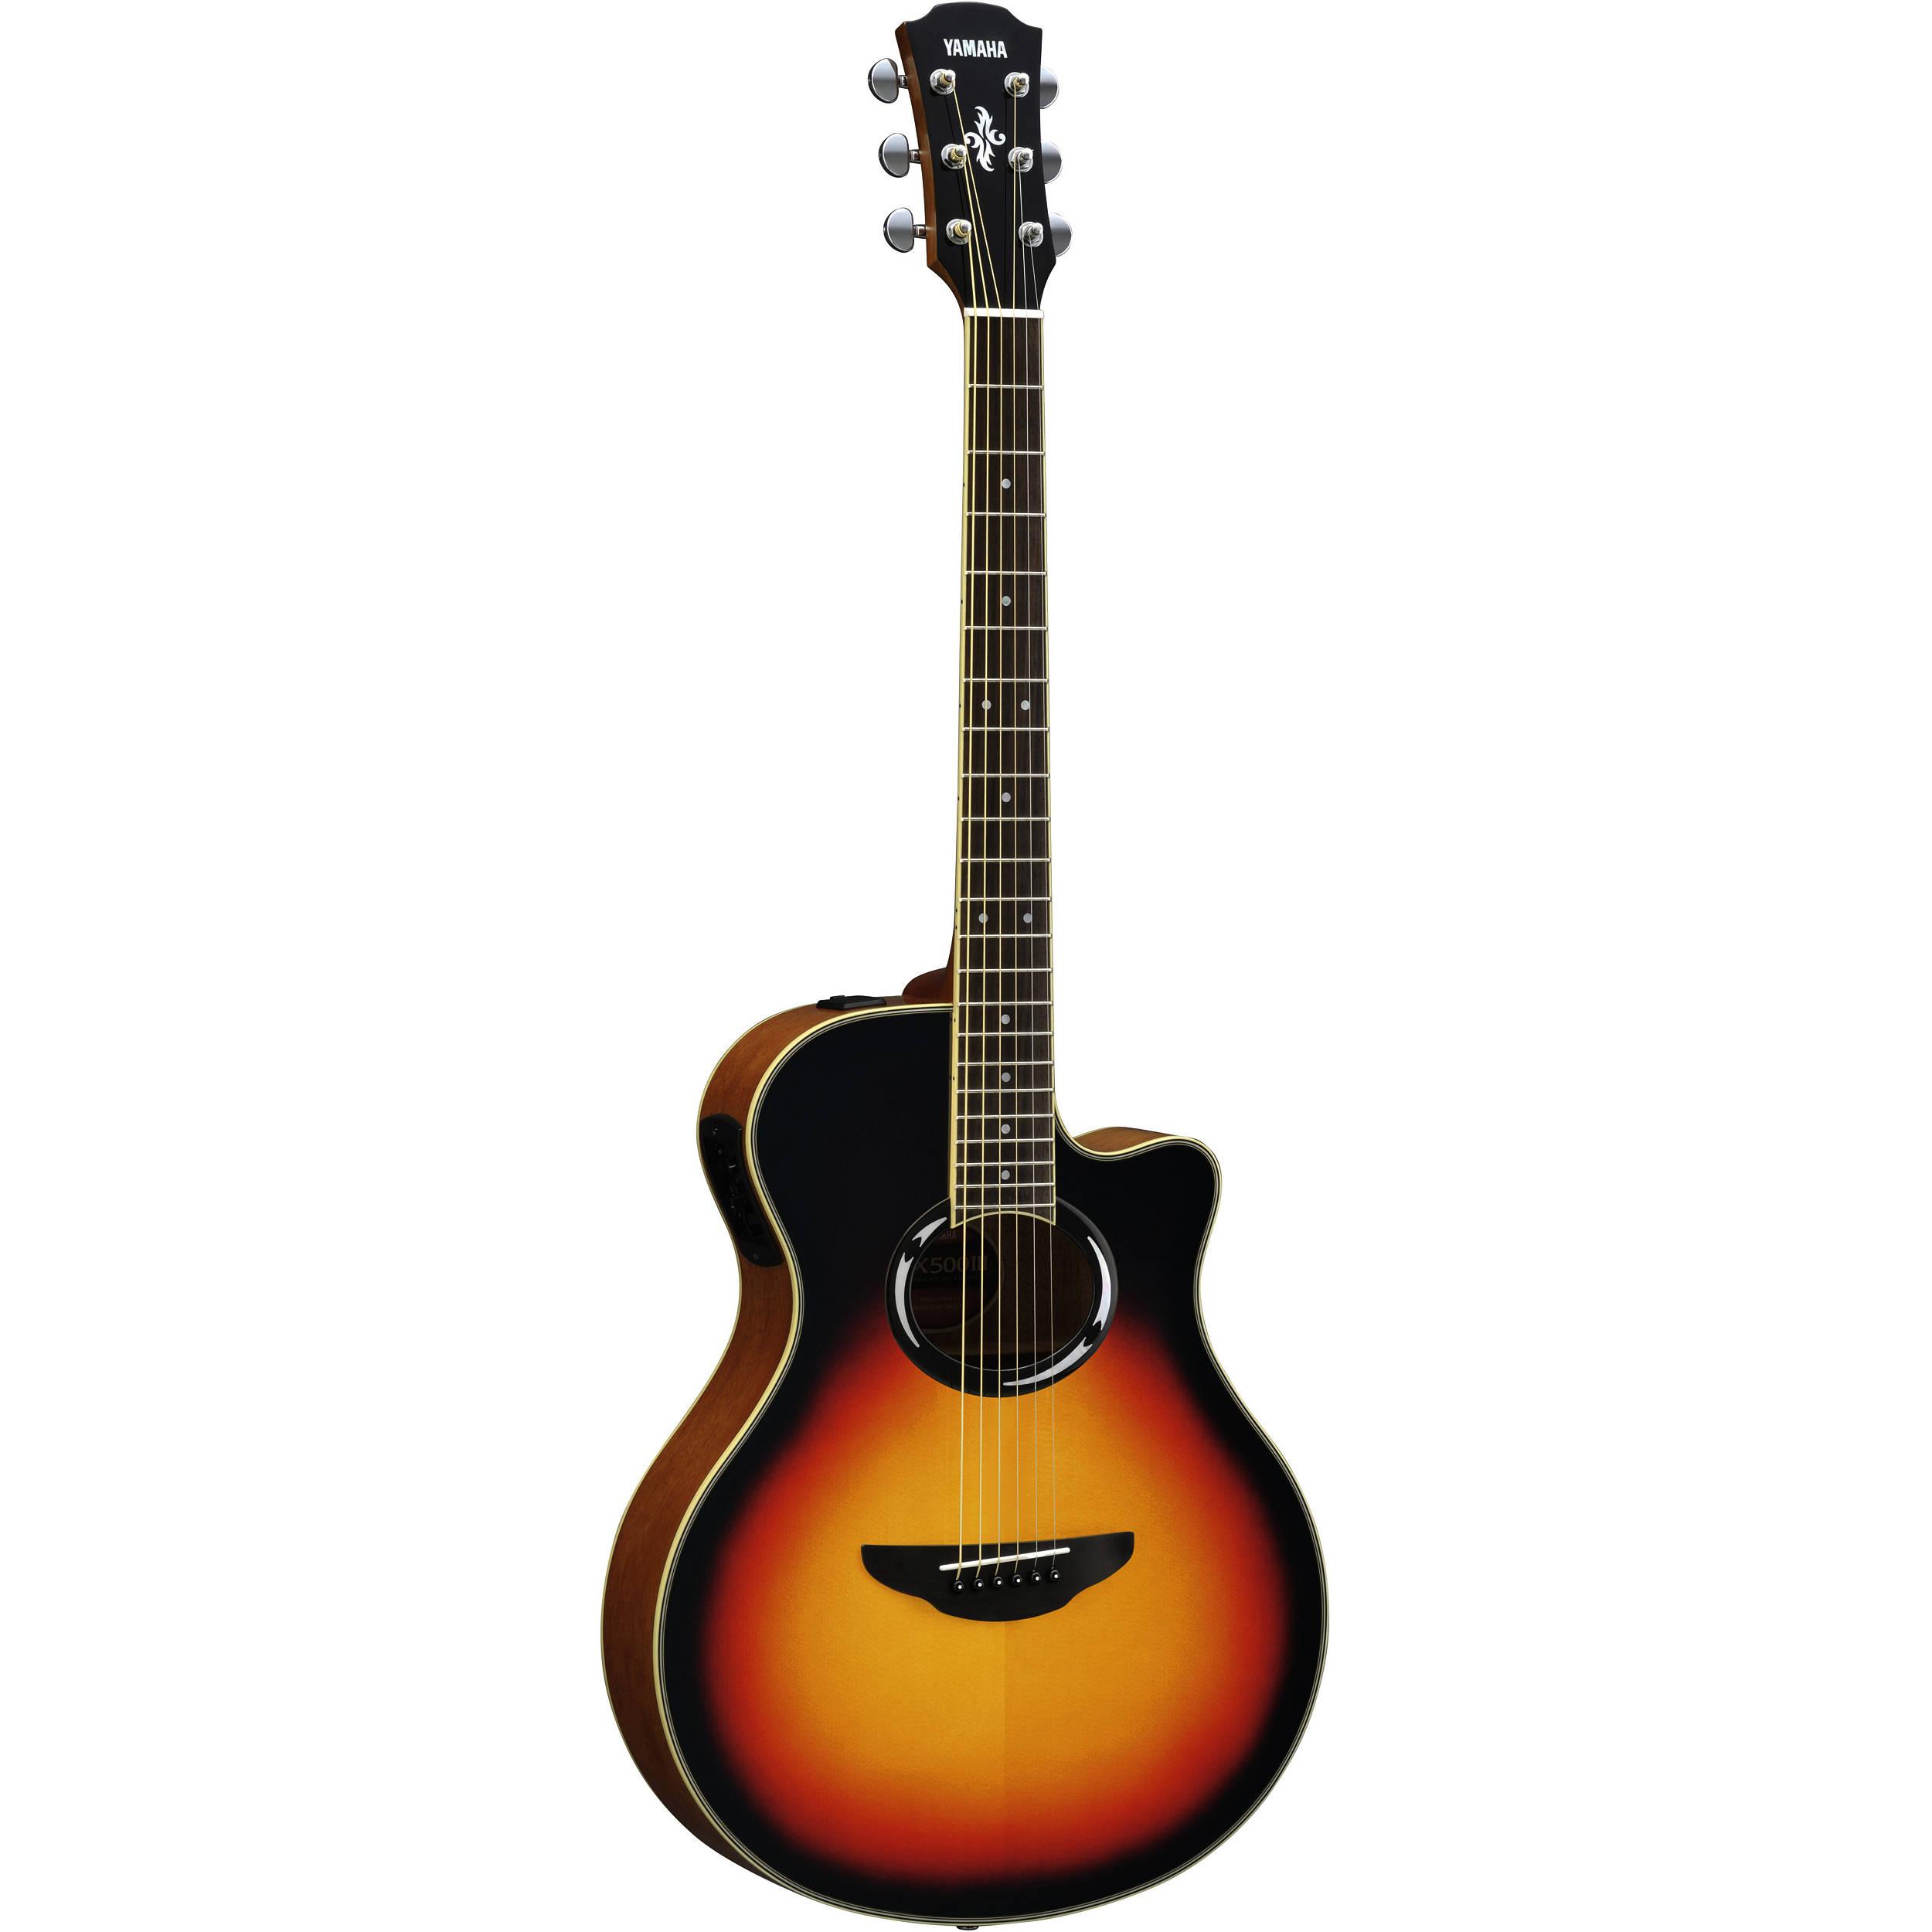 Yamaha Thinline Acoustic Guitar